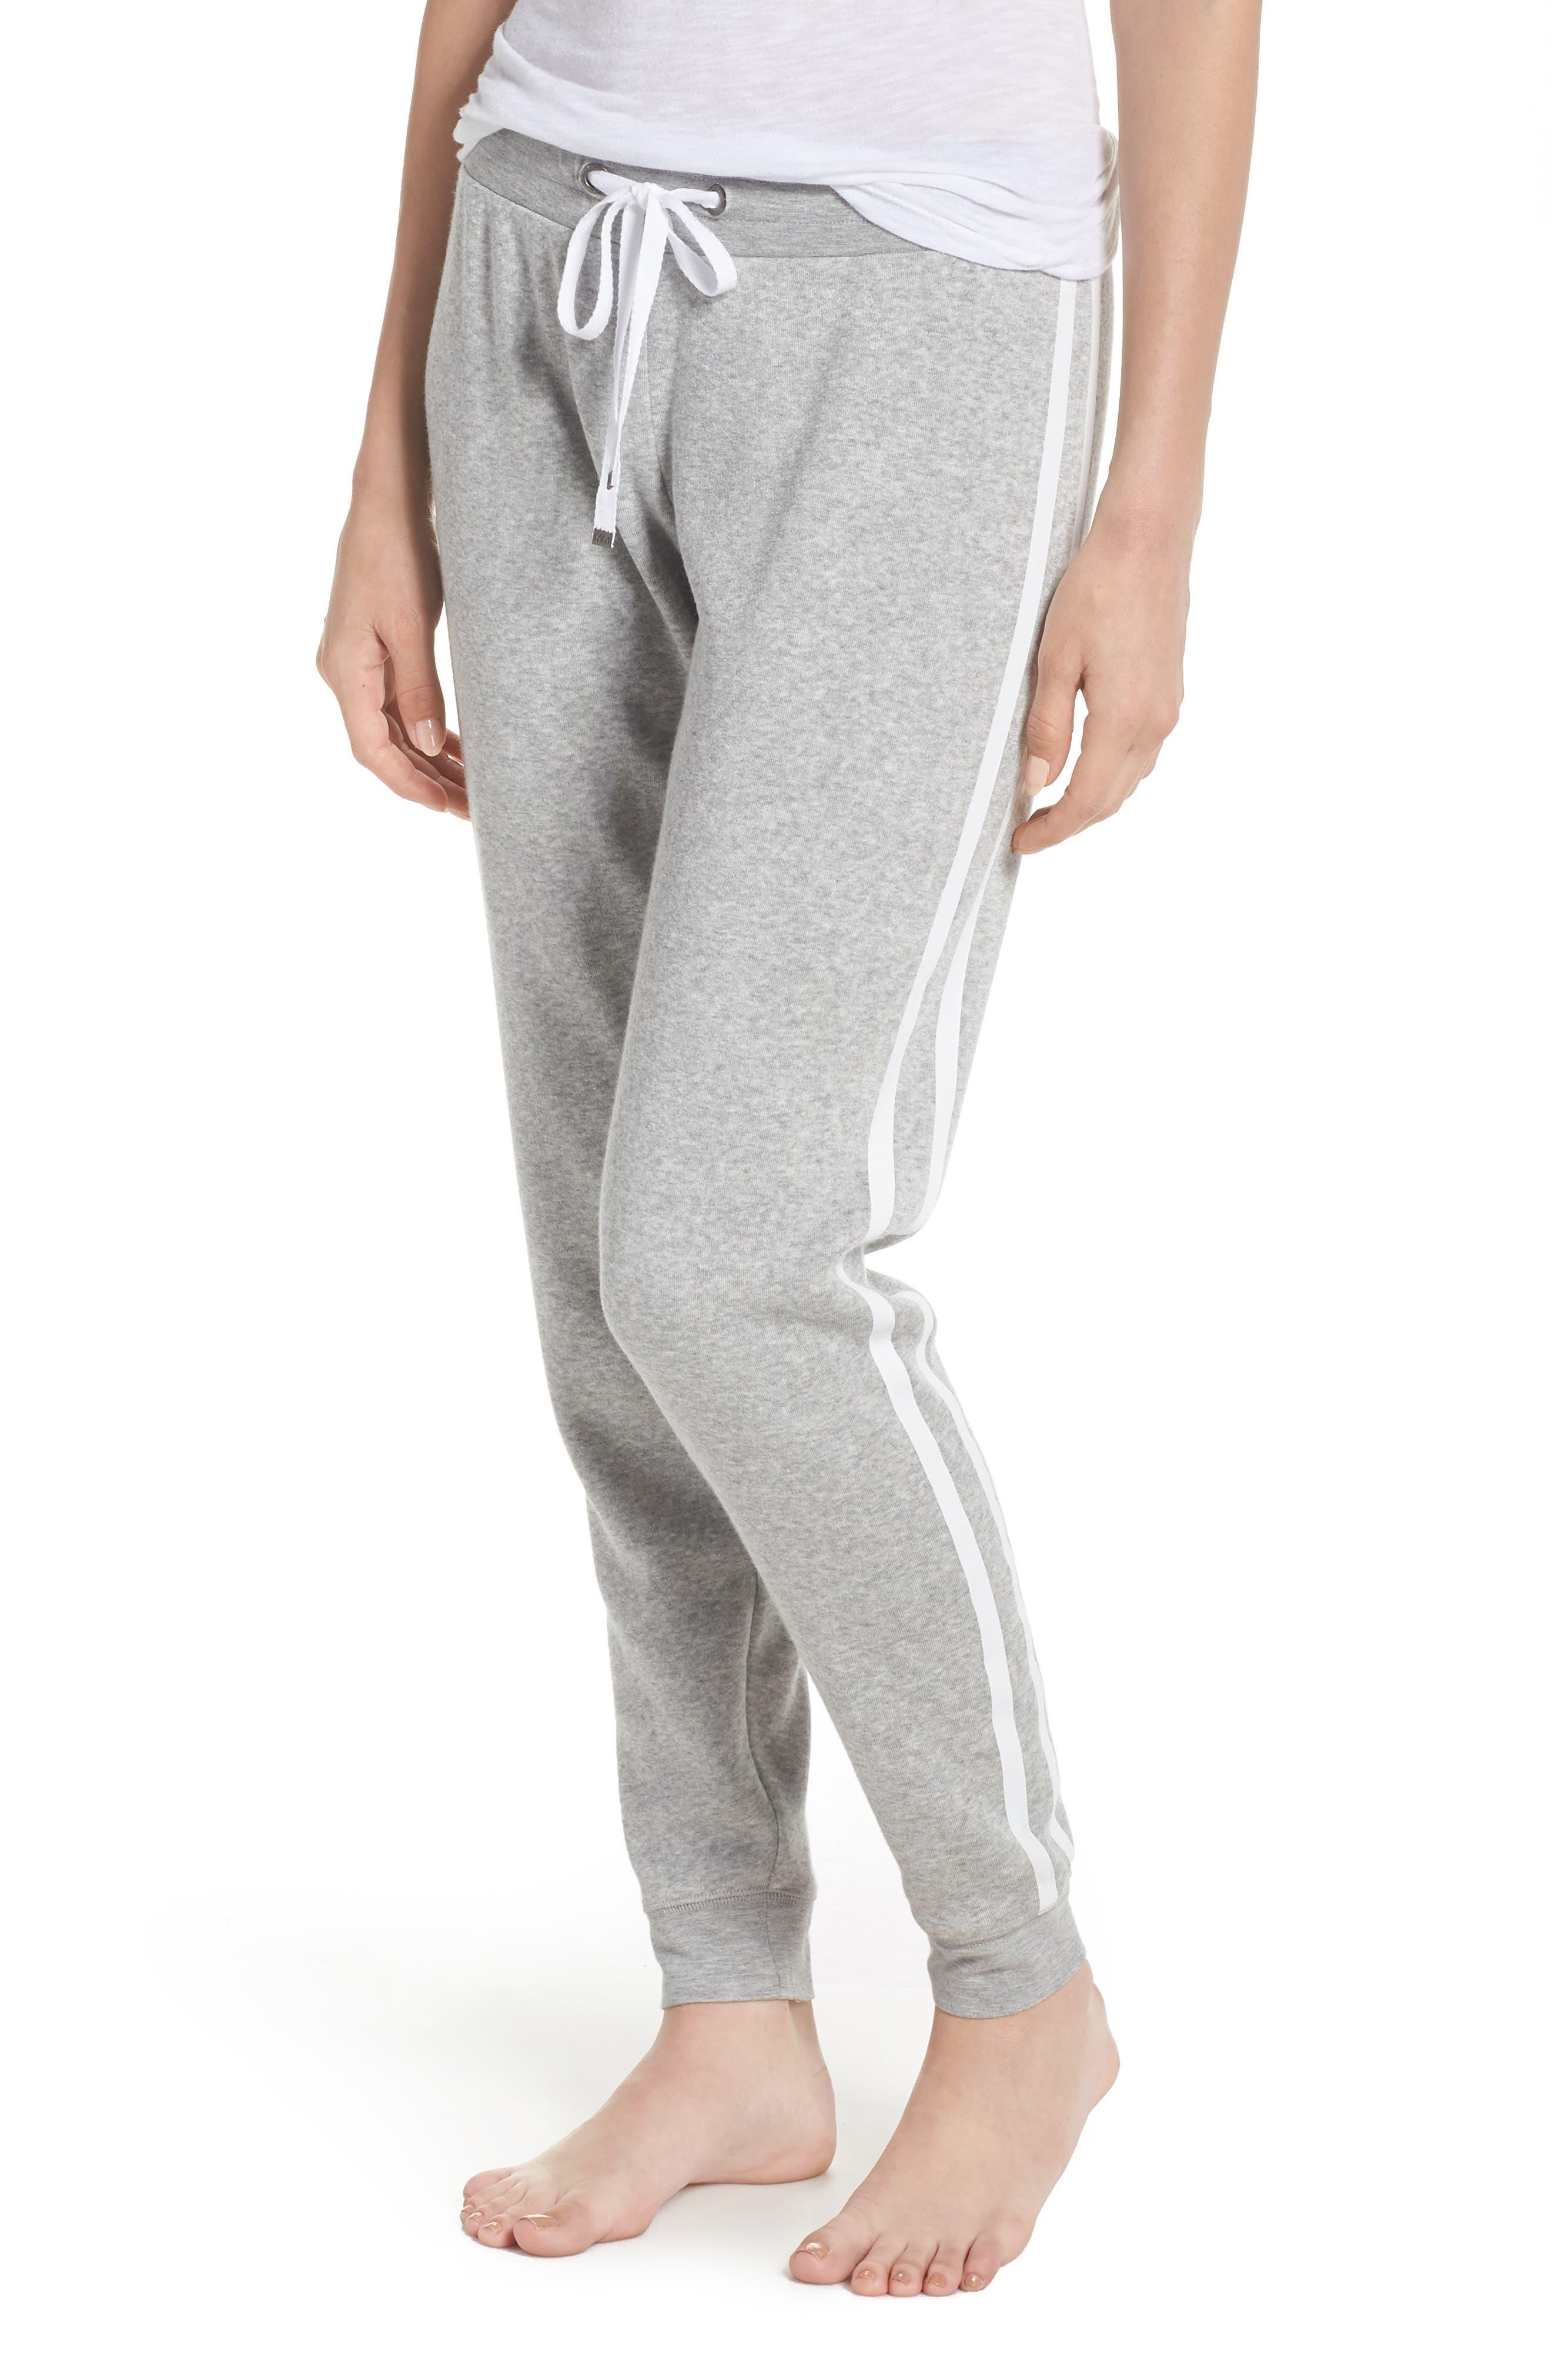 Firecracker Jogger Pajama Pants,                         Main,                         color, 021